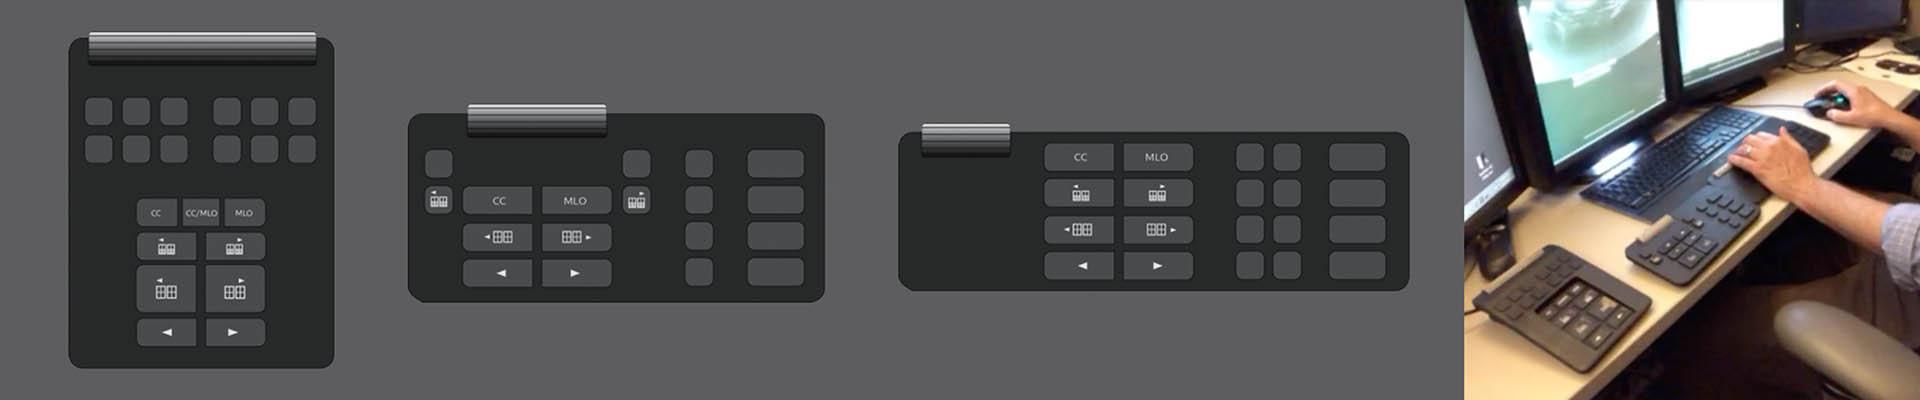 keypad 05